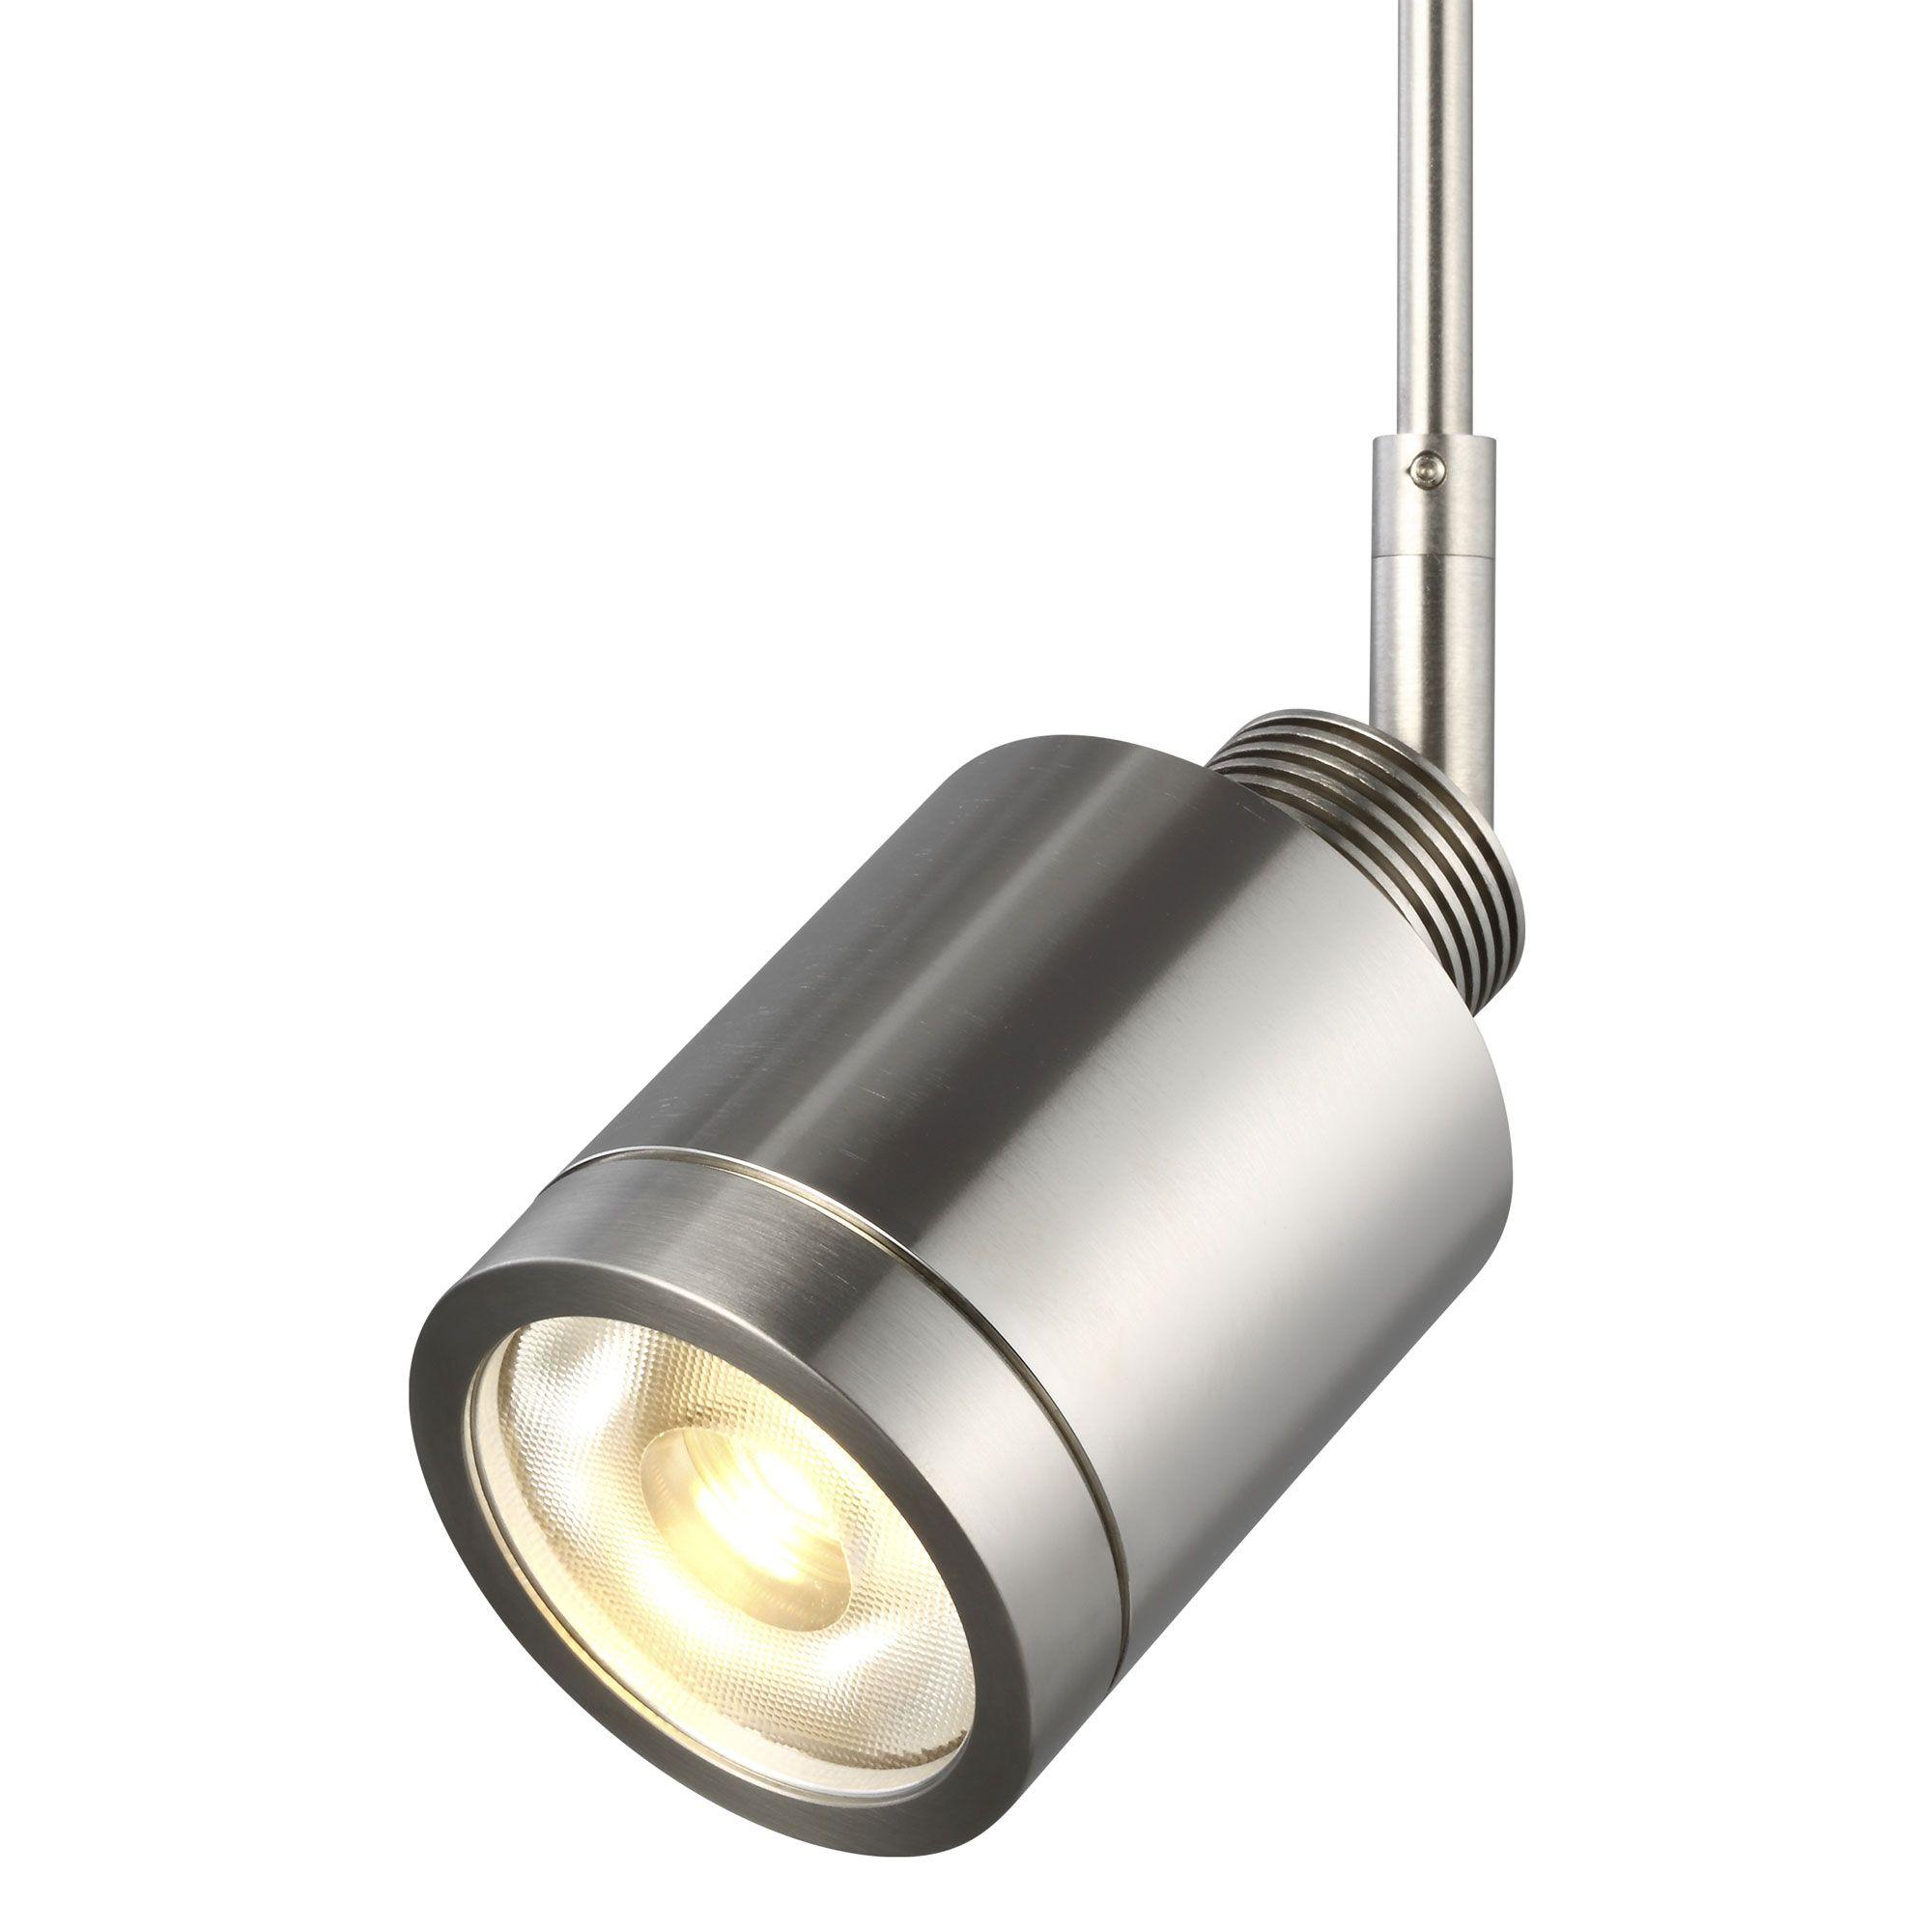 The Tellium Monorail 2Circuit LED Head combines